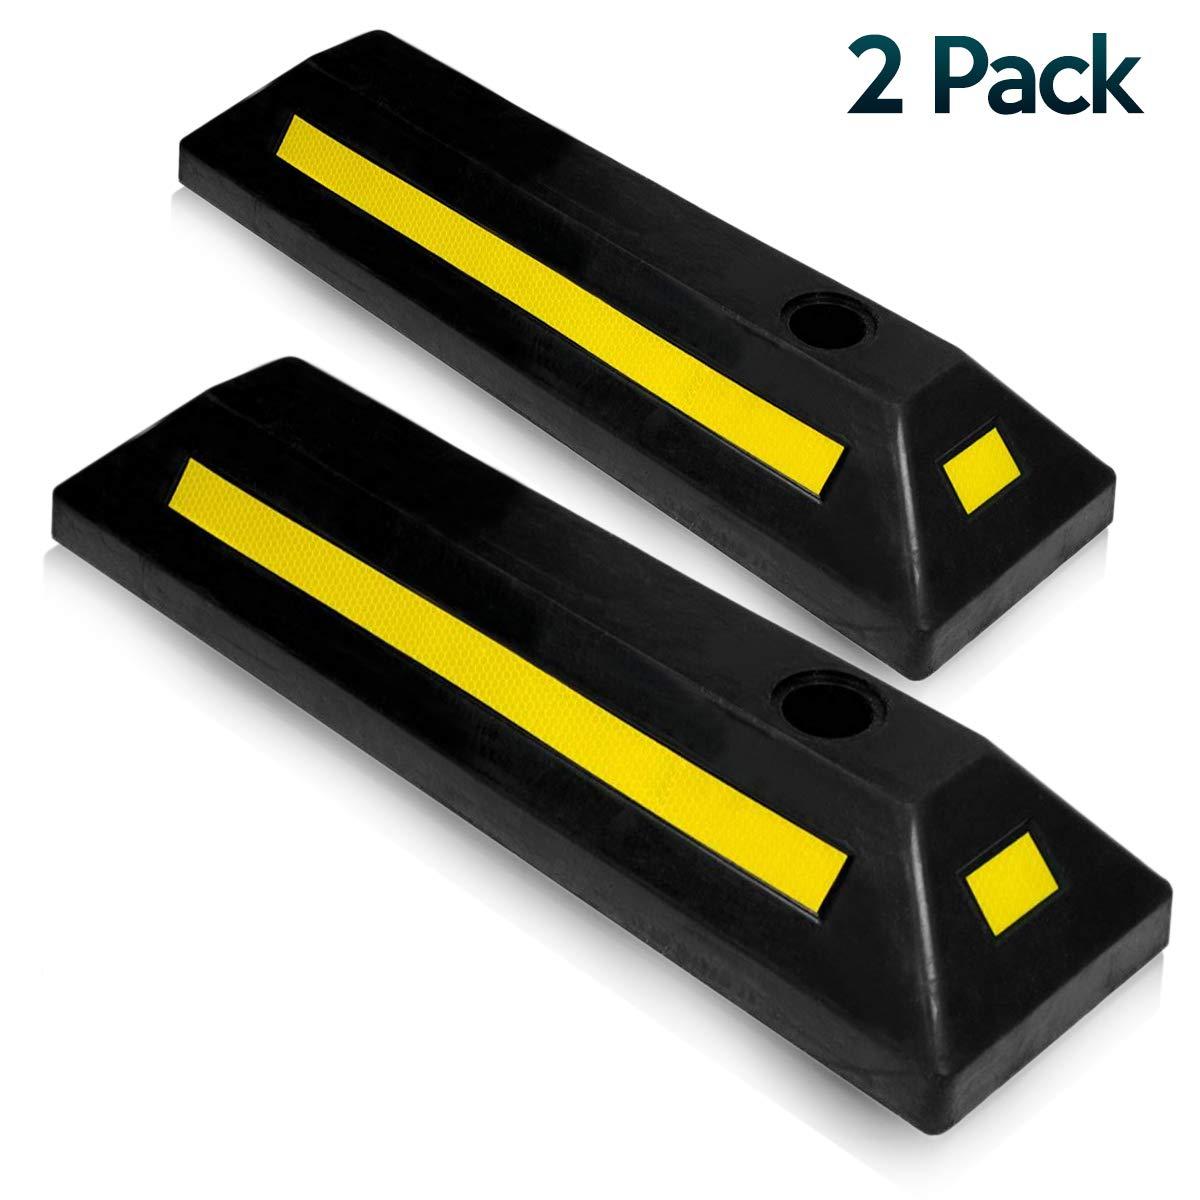 2 Pcs Premium Quality Durable Car Garage Wheel Stopper Zone Tech Heavy Duty Rubber Parking Guide